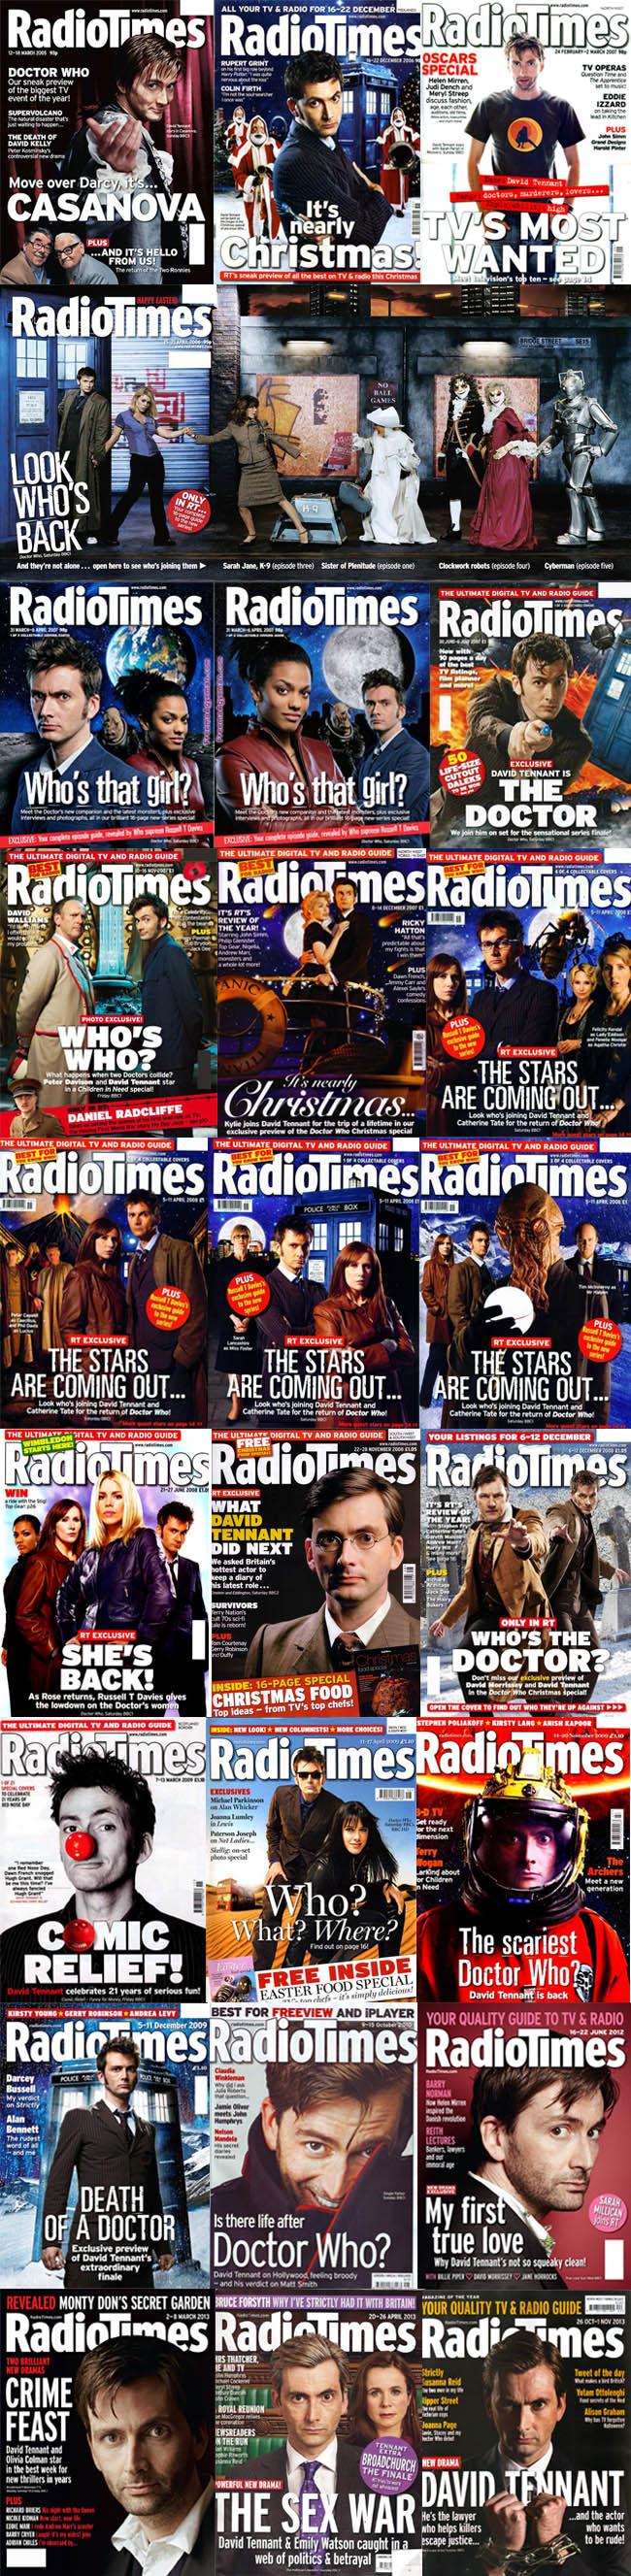 radioTimesAll.jpg (650×2654)